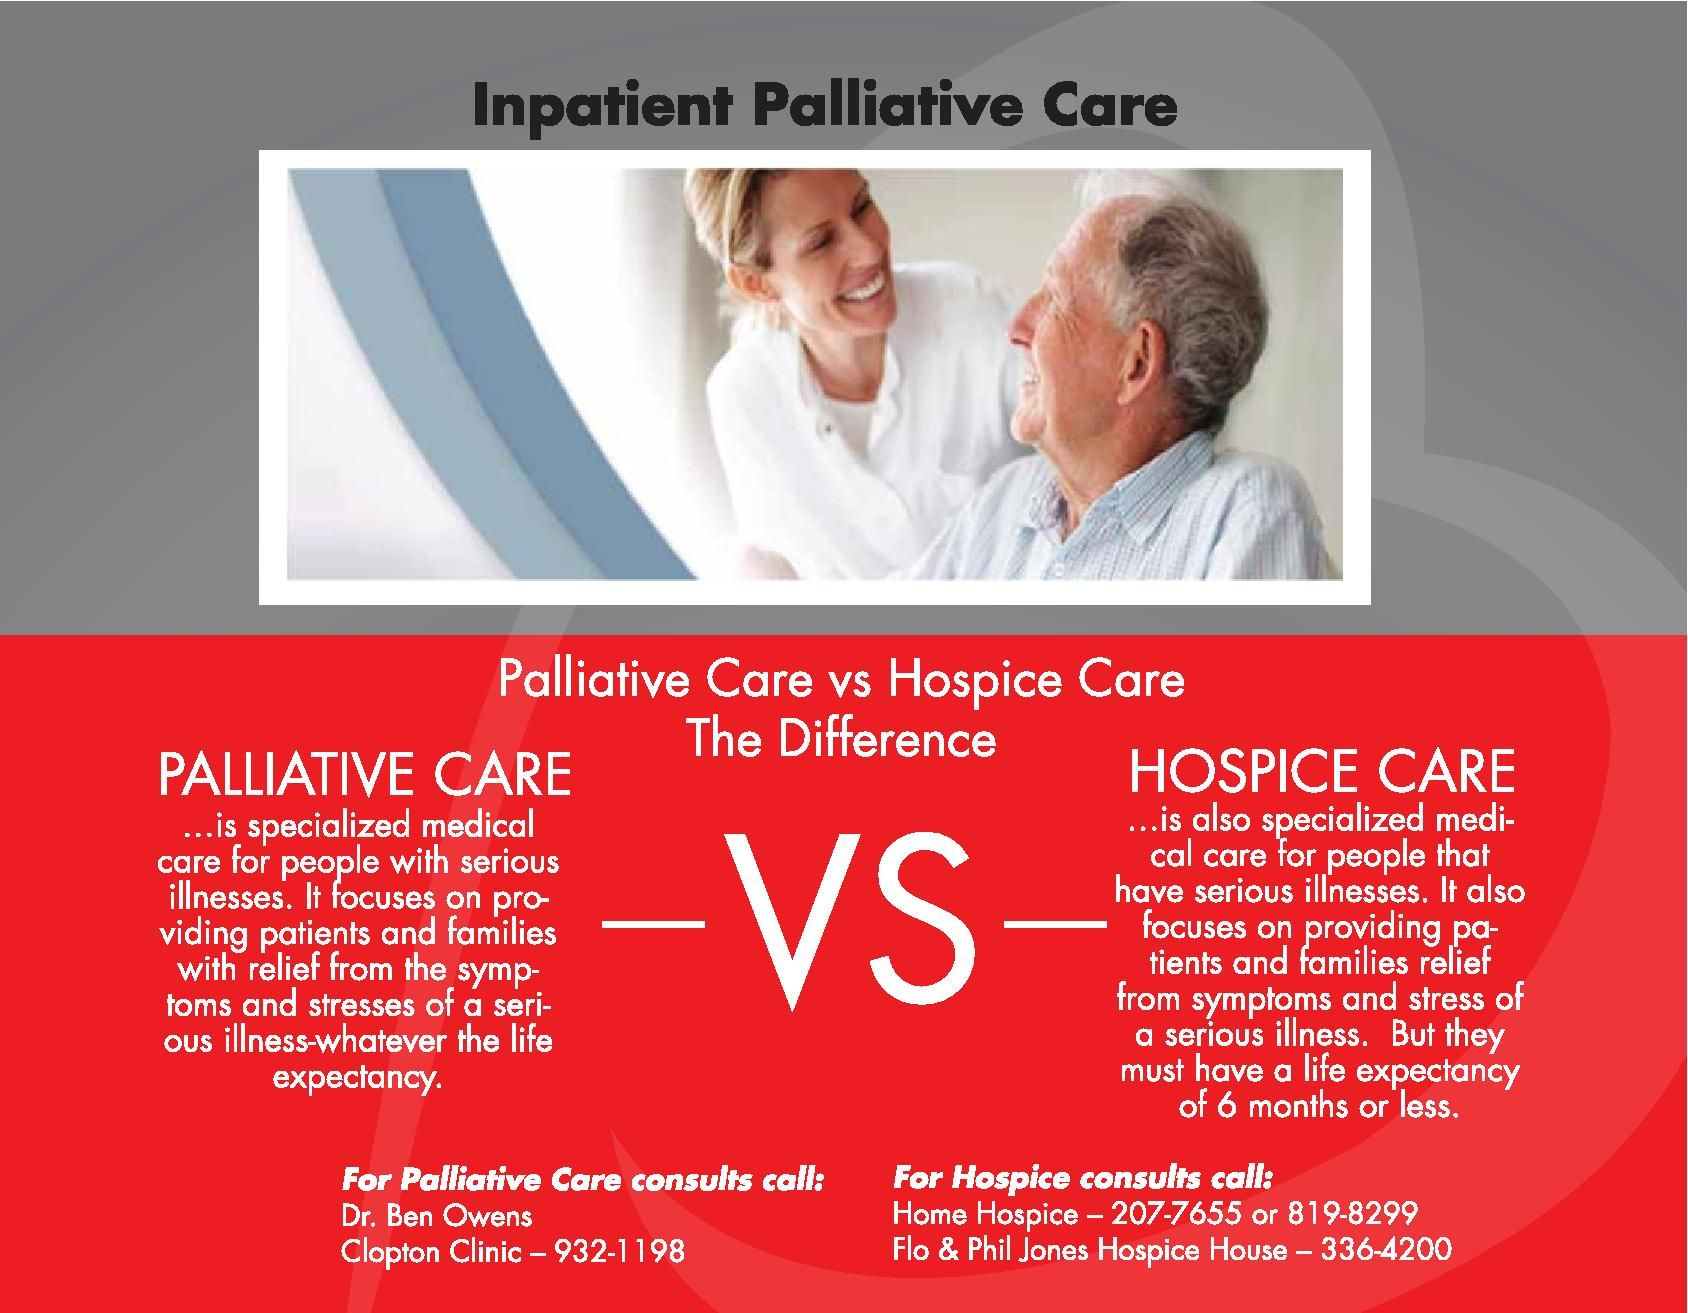 Palliative Care vs. Hospice Care Health Information